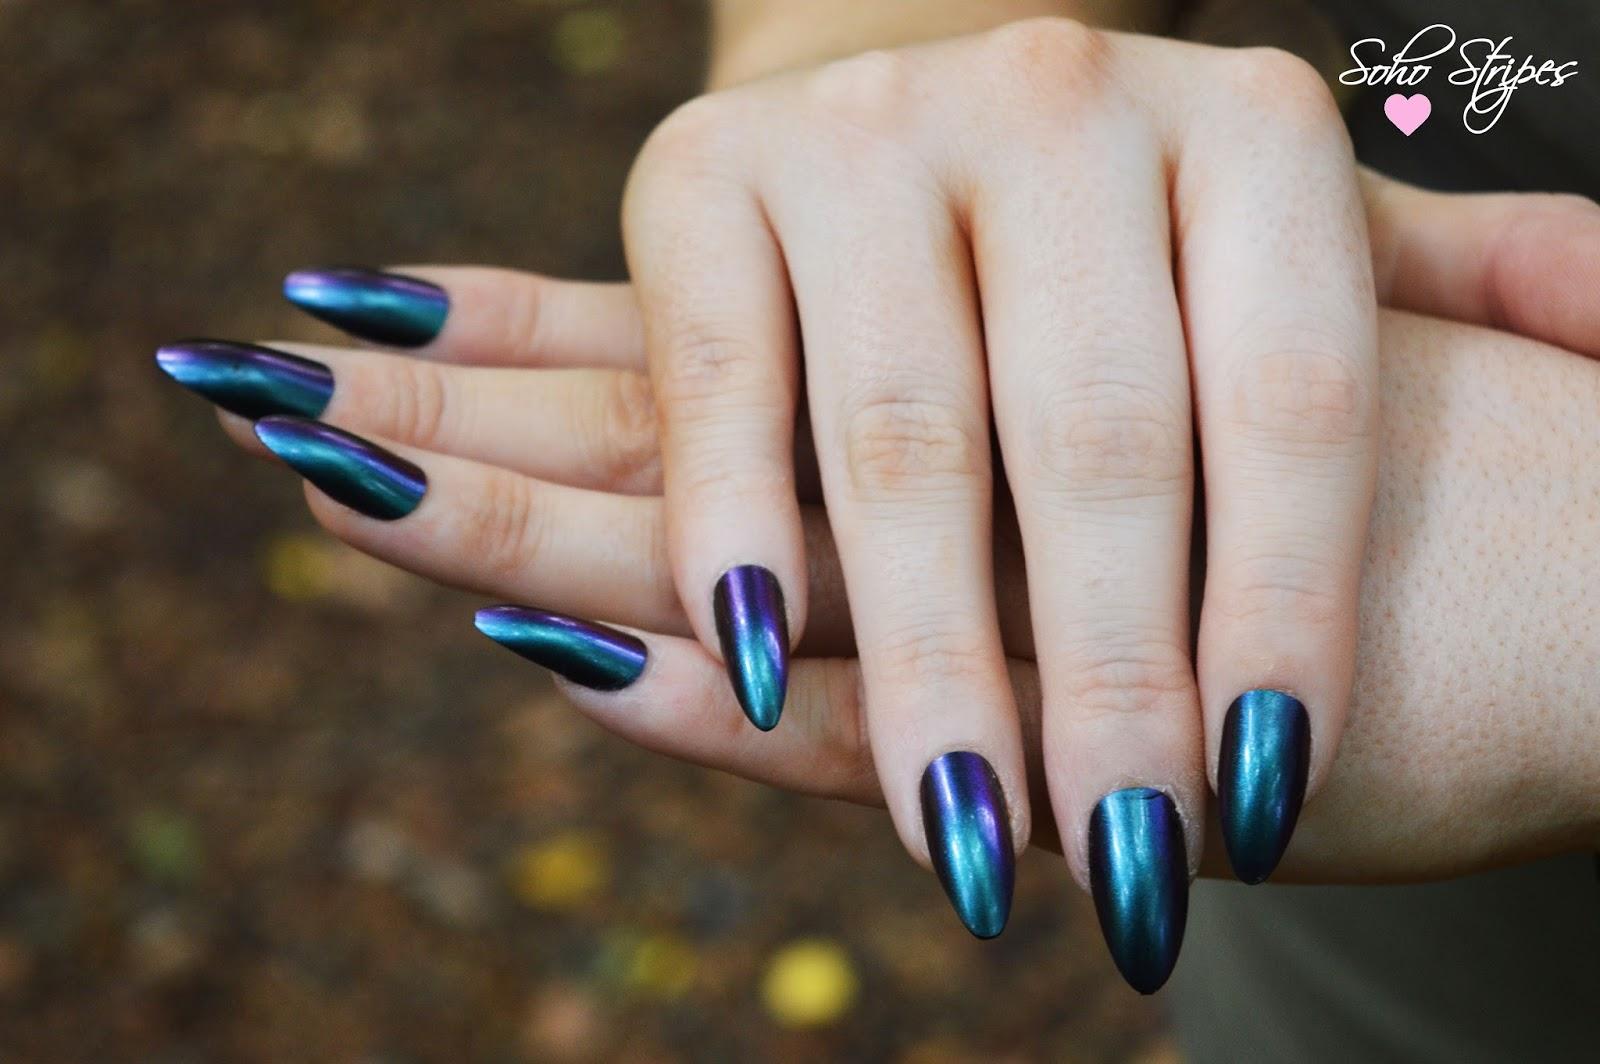 Primark Mermaid False Nails - Only £2